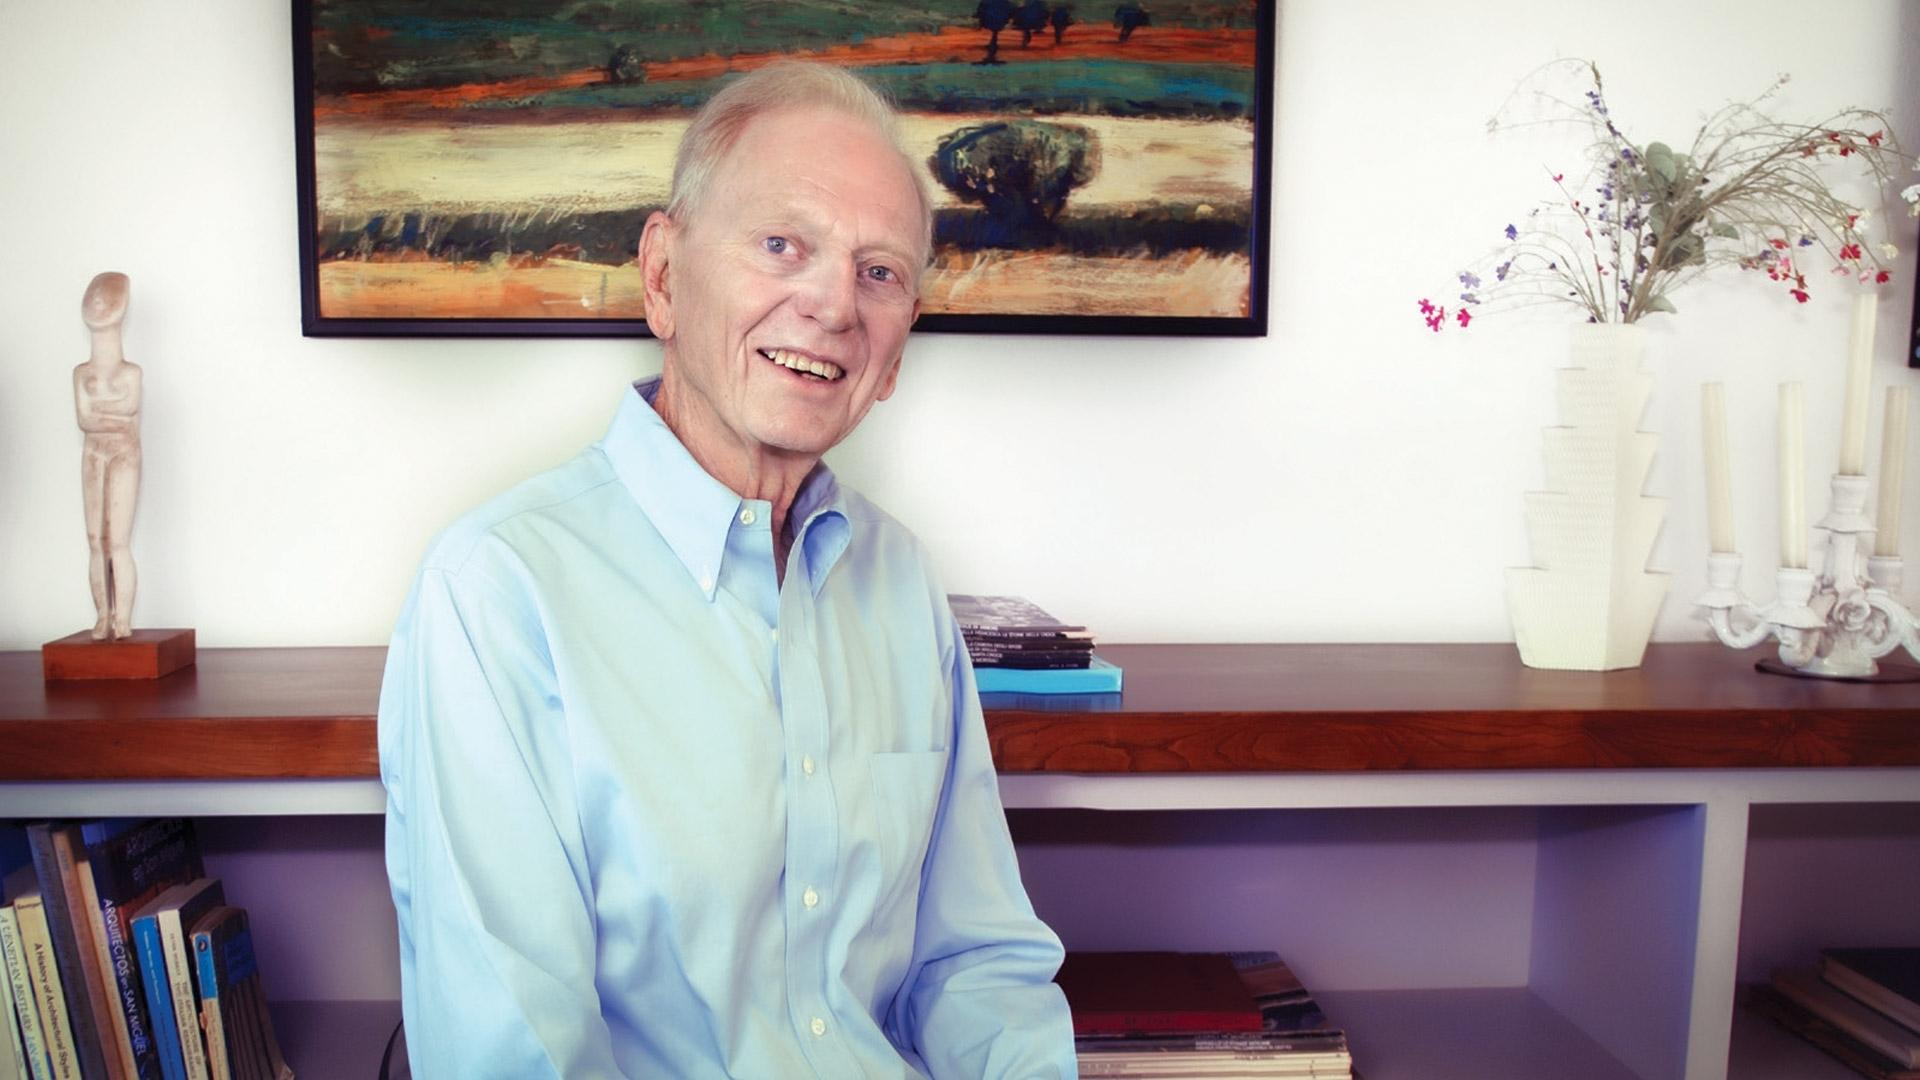 Austin Briggs, Hamilton B. Tompkins Professor of English Literature (1957-2000)